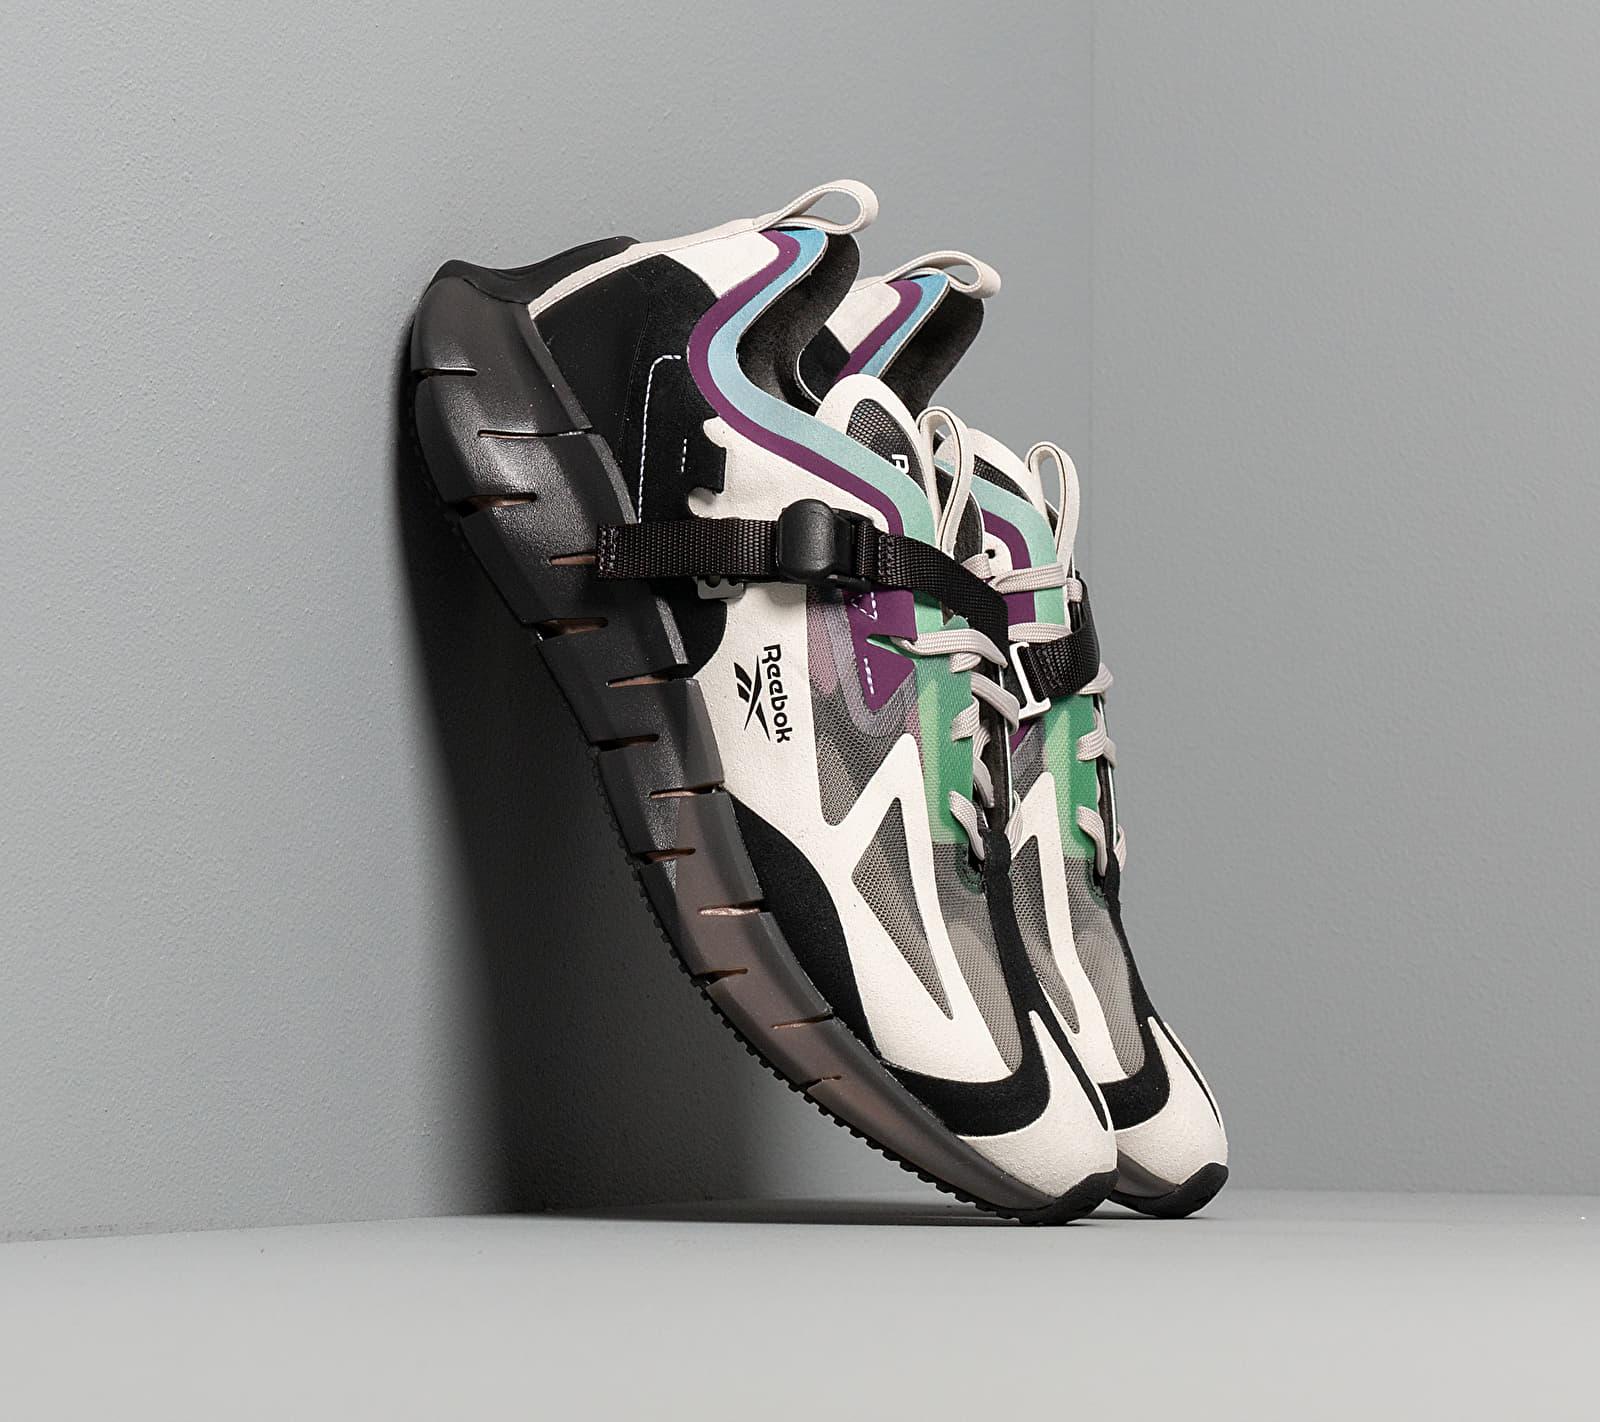 Reebok Zig Kinetica Concept_Type 1 Sand Stone/ Black/ Emerald, Brown